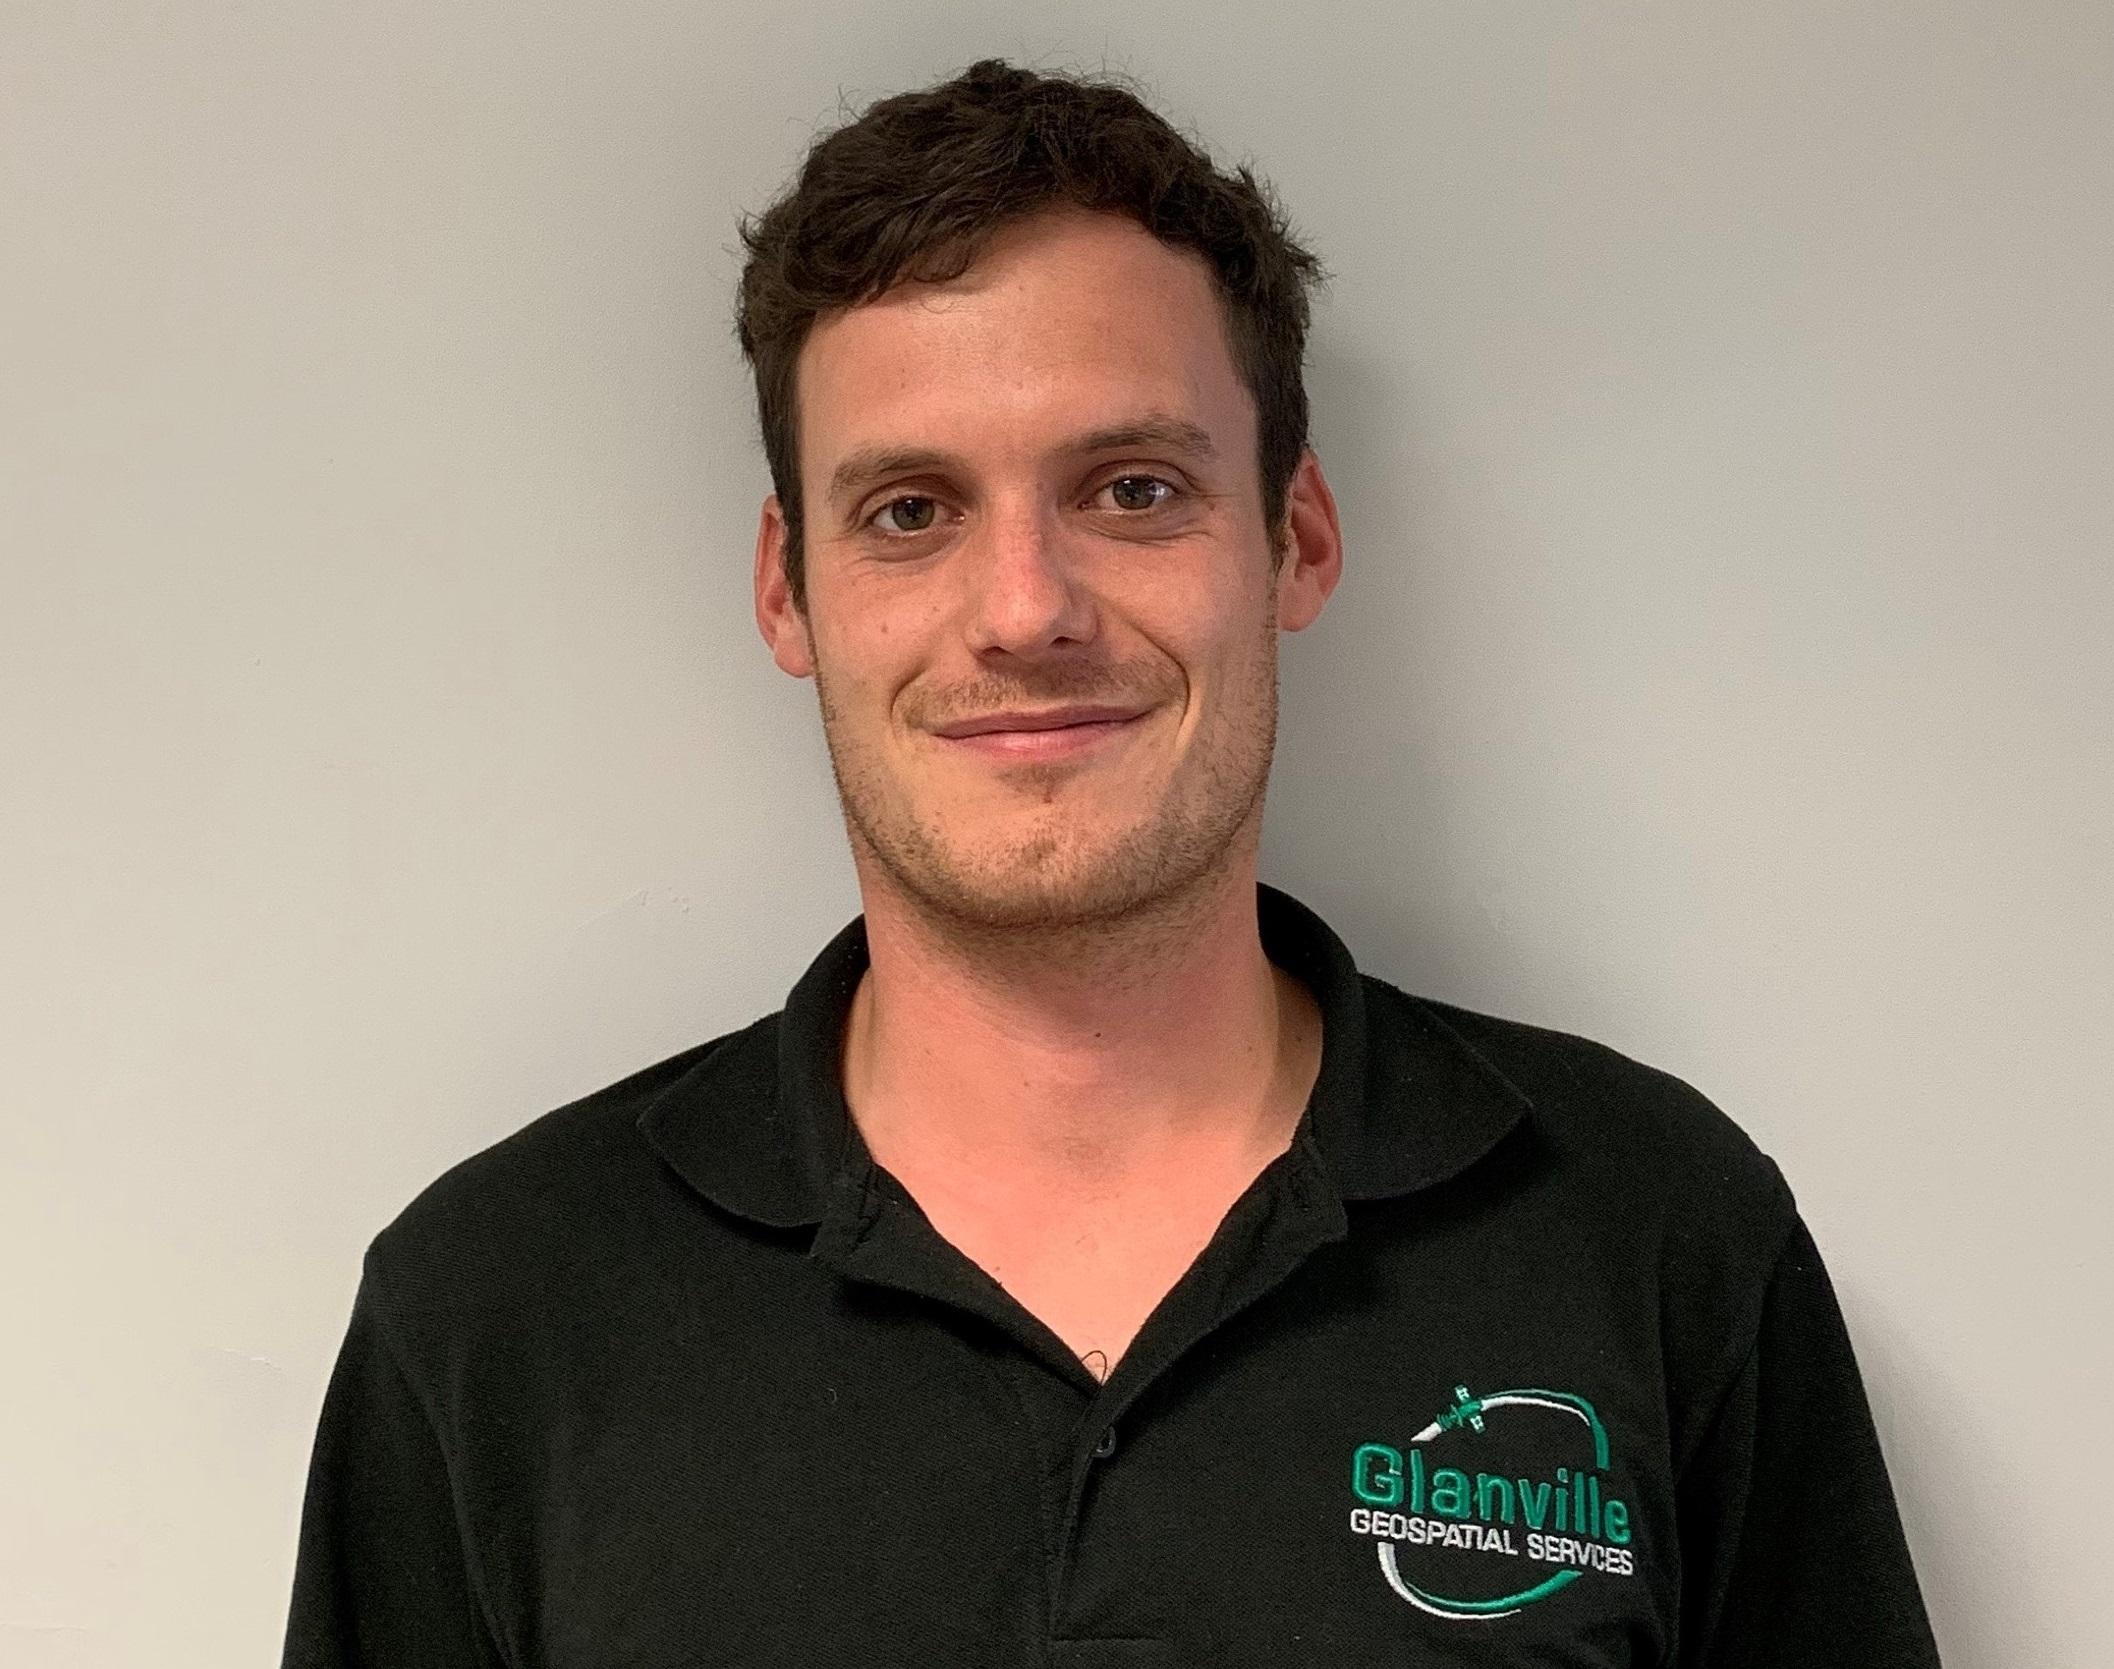 Jake Smith, Glanville Geospatial Services, Devon